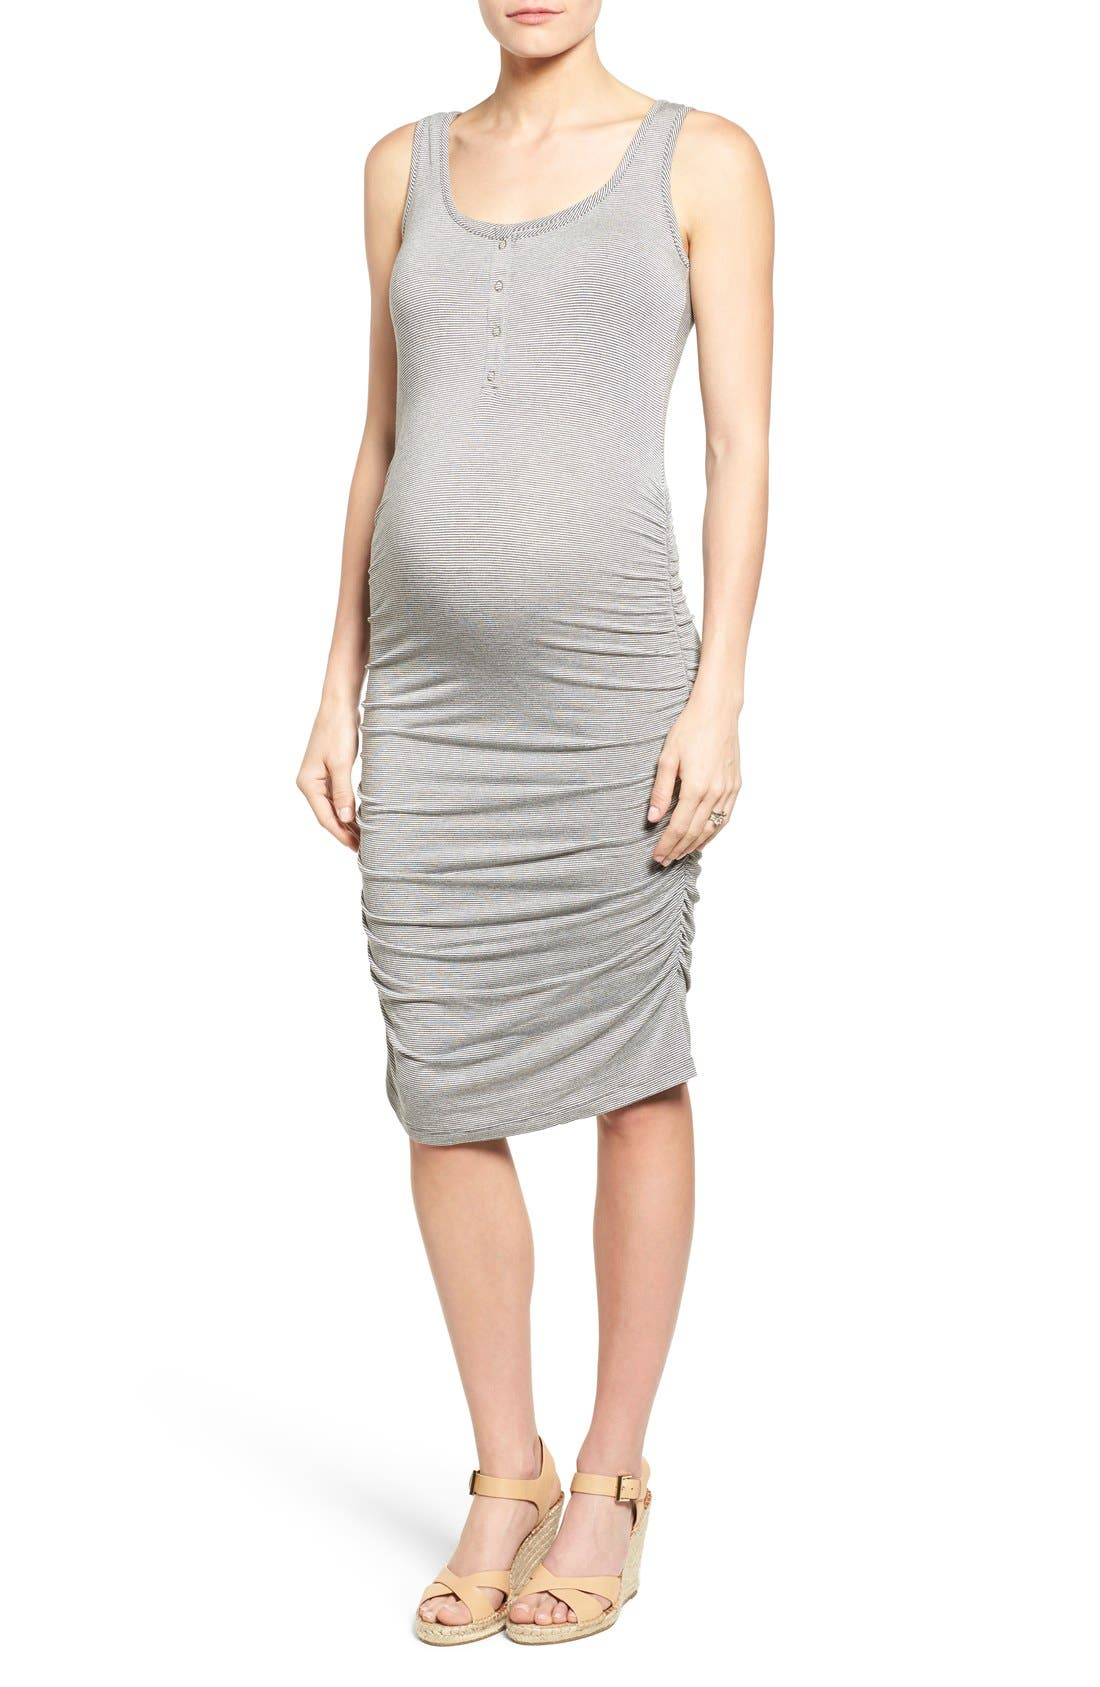 Sleeveless Maternity/Nursing Dress,                             Main thumbnail 1, color,                             CHARCOAL MICROSTRIPE